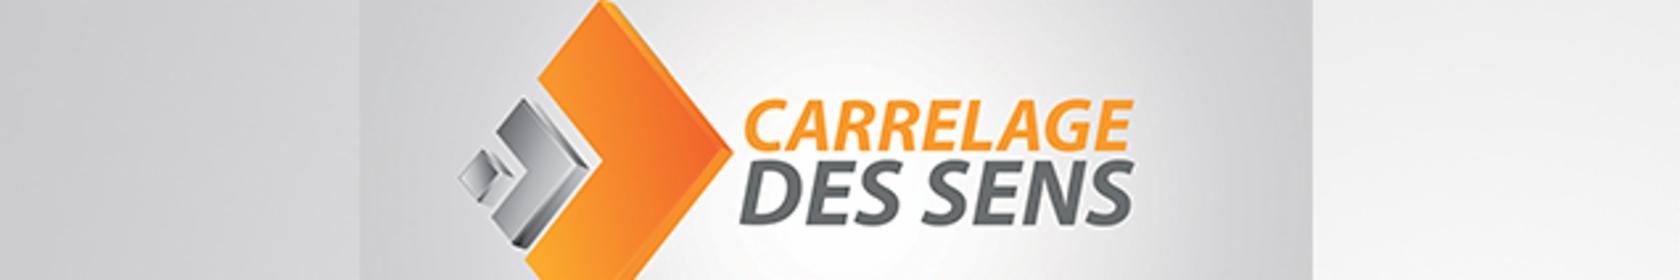 F CARRELAGE CARRELAGE DES SENS Recrutement Toutes Les Offres - 2f carrelage